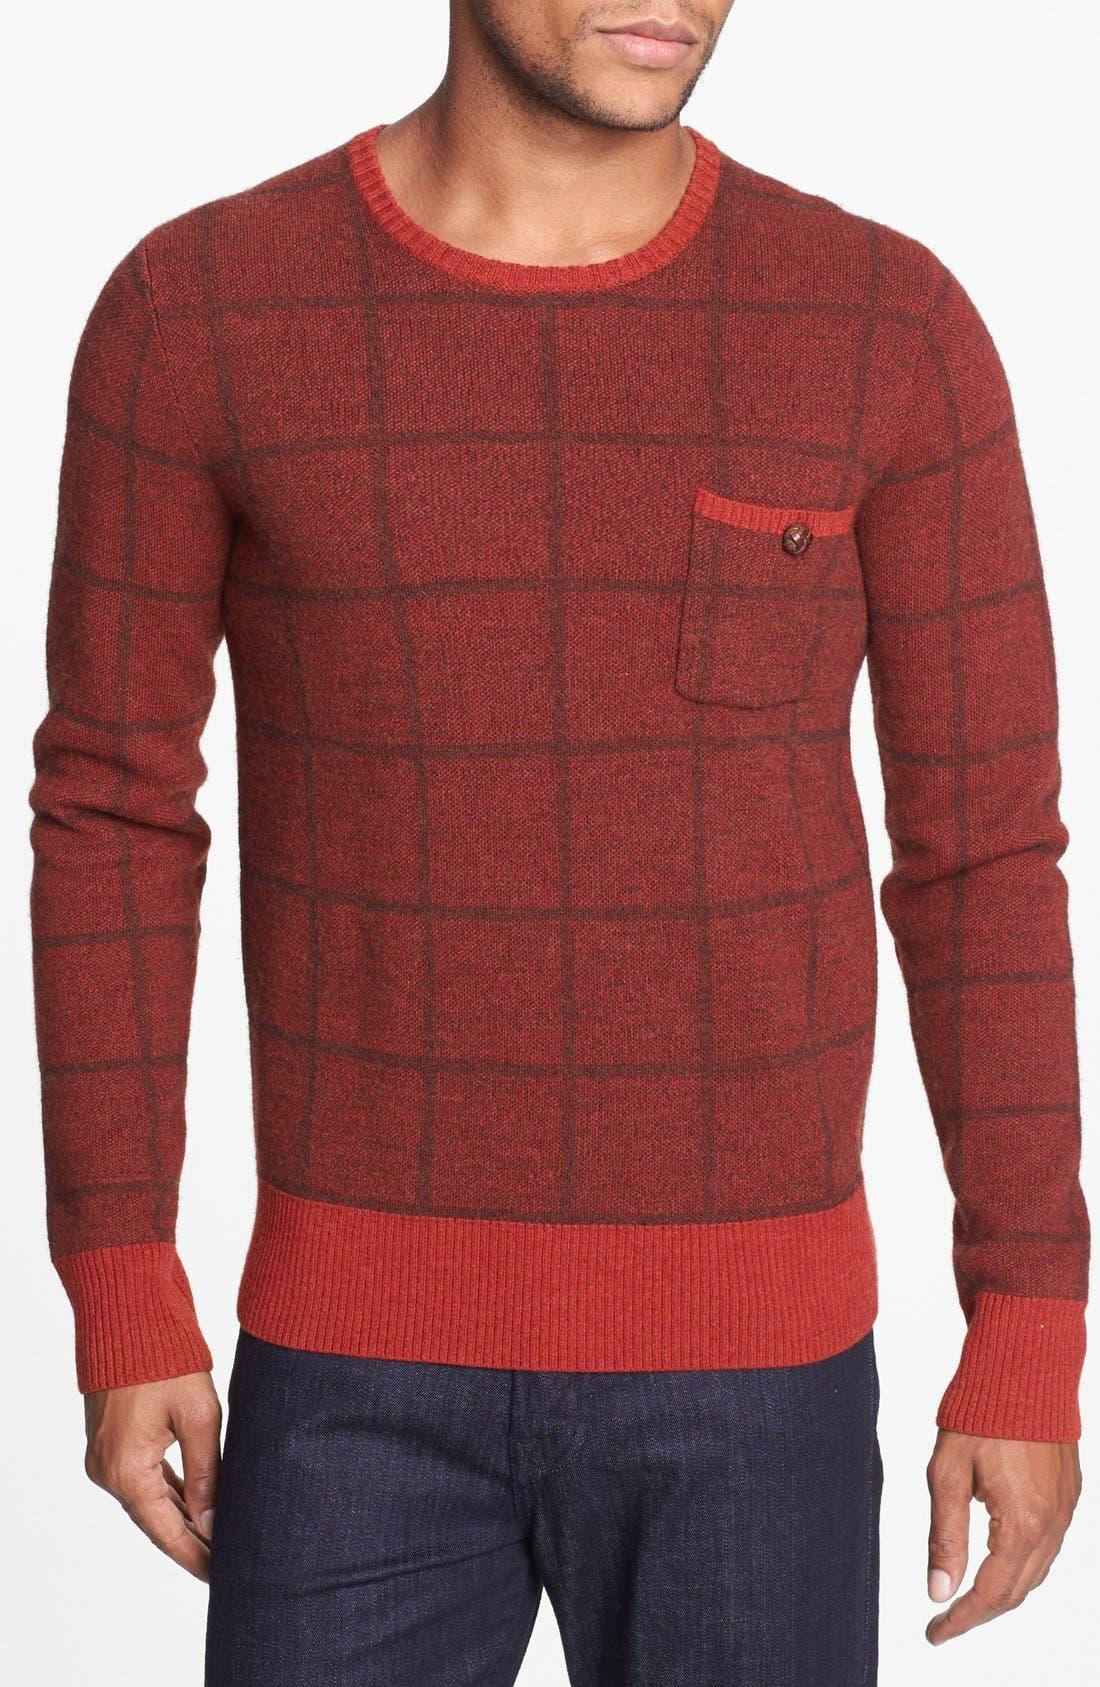 Alternate Image 1 Selected - J. Press York Street Windowpane Merino Wool Crewneck Sweater